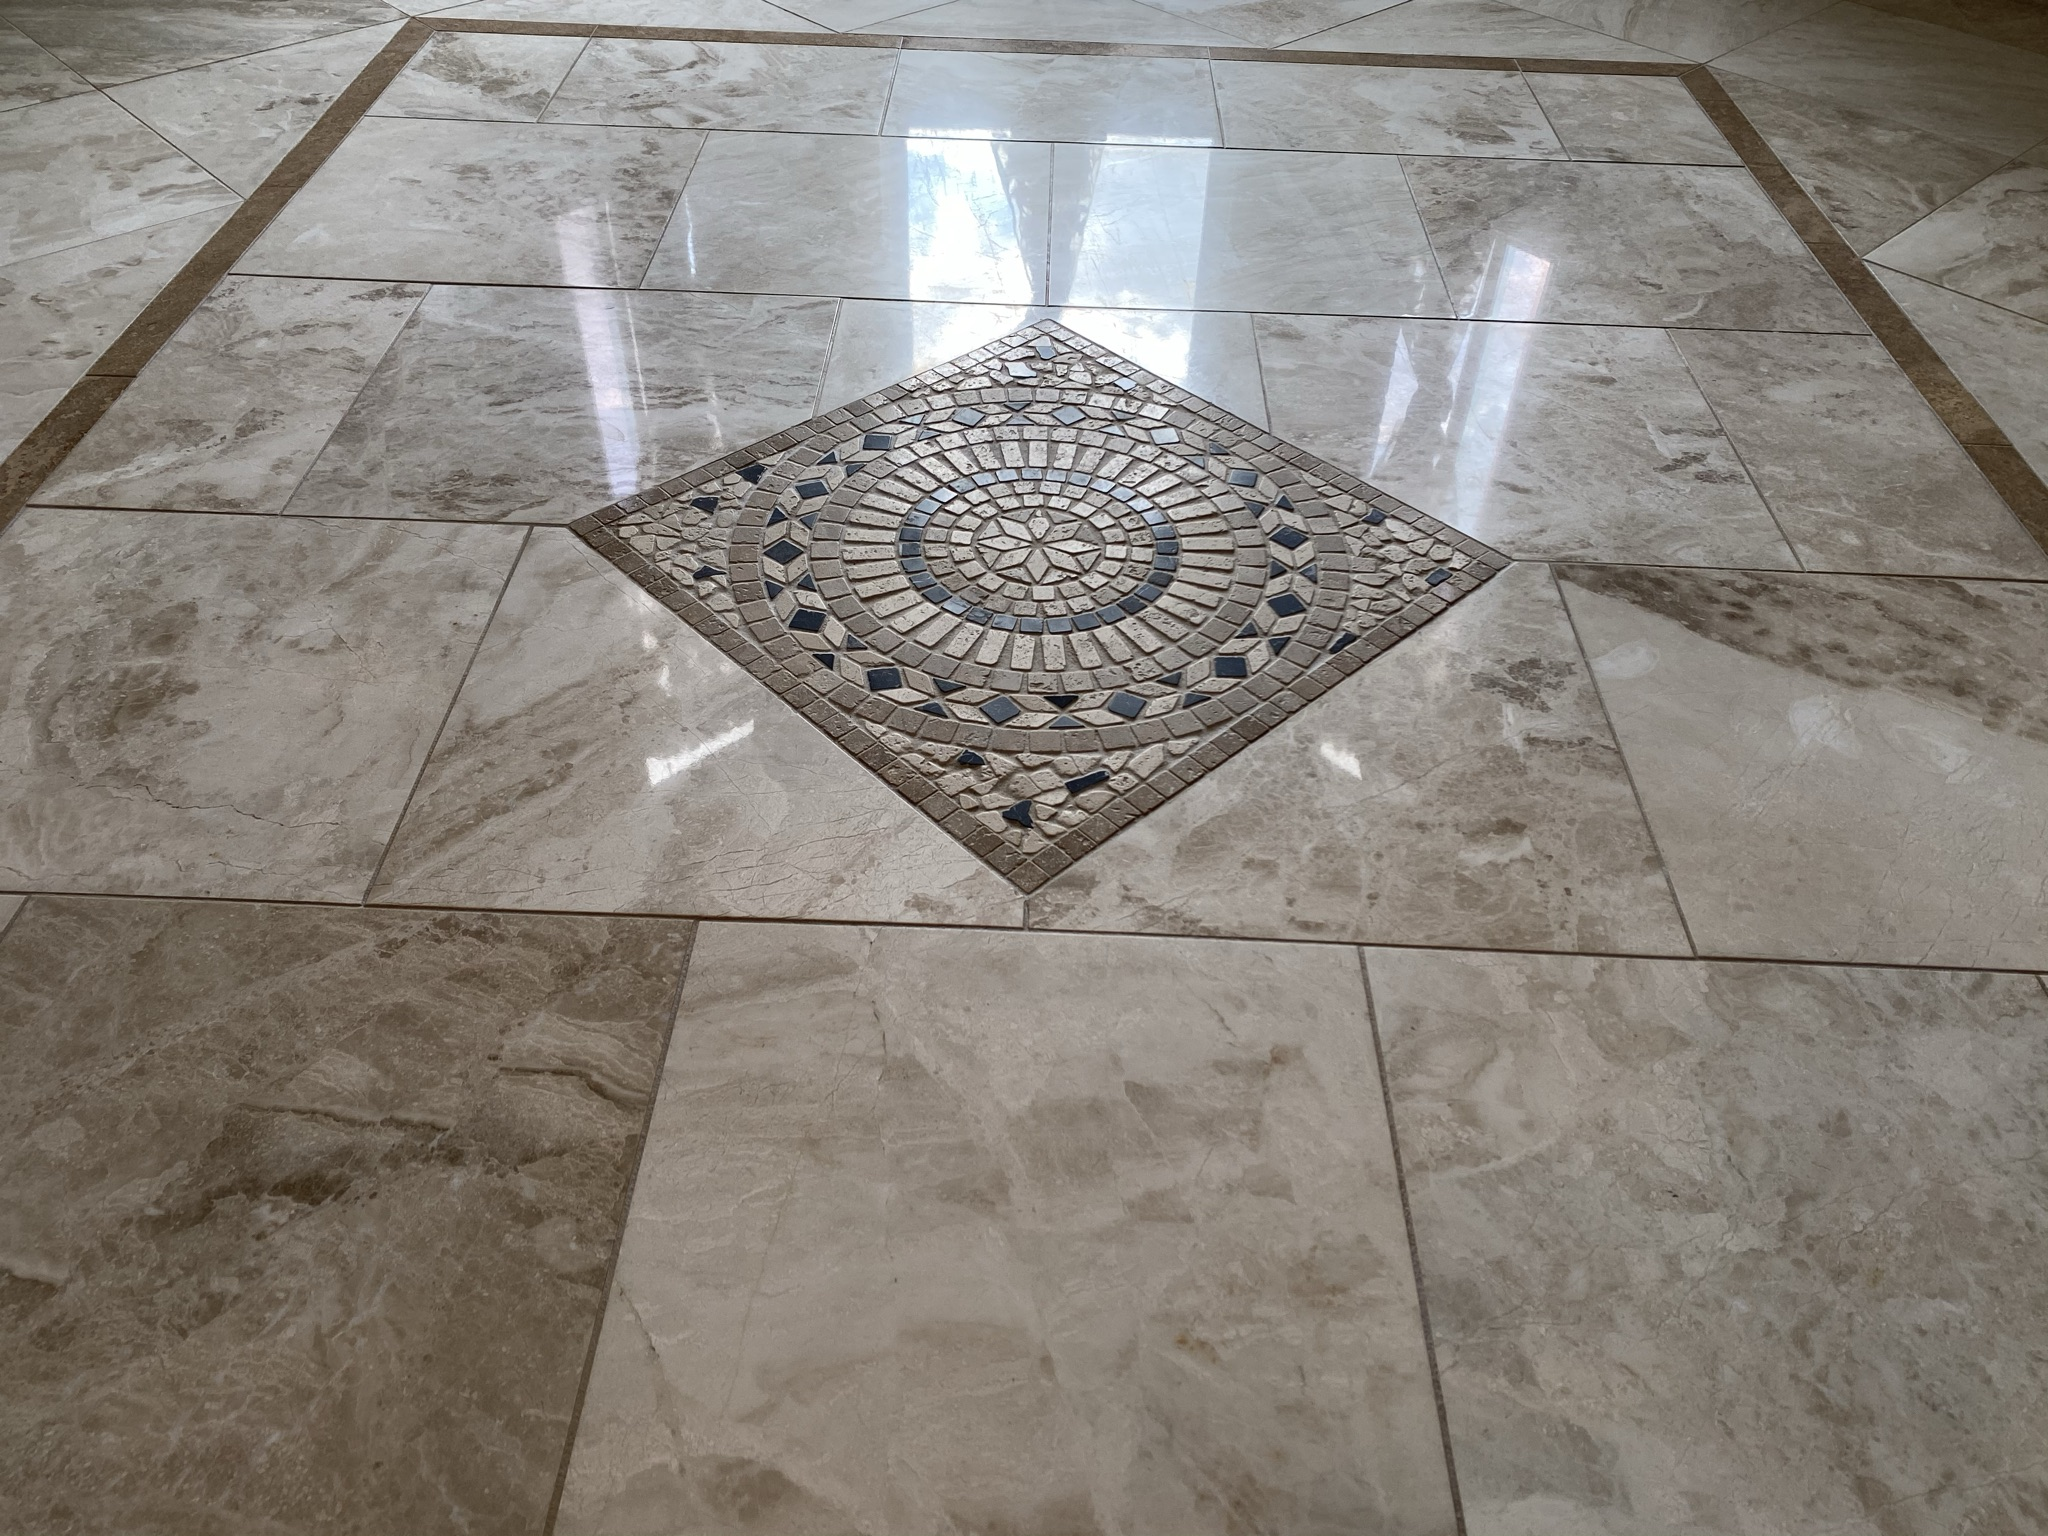 Marble Tile Floor Polishing (marble restoration, grout cleaning, floor polishing, marble sealing)